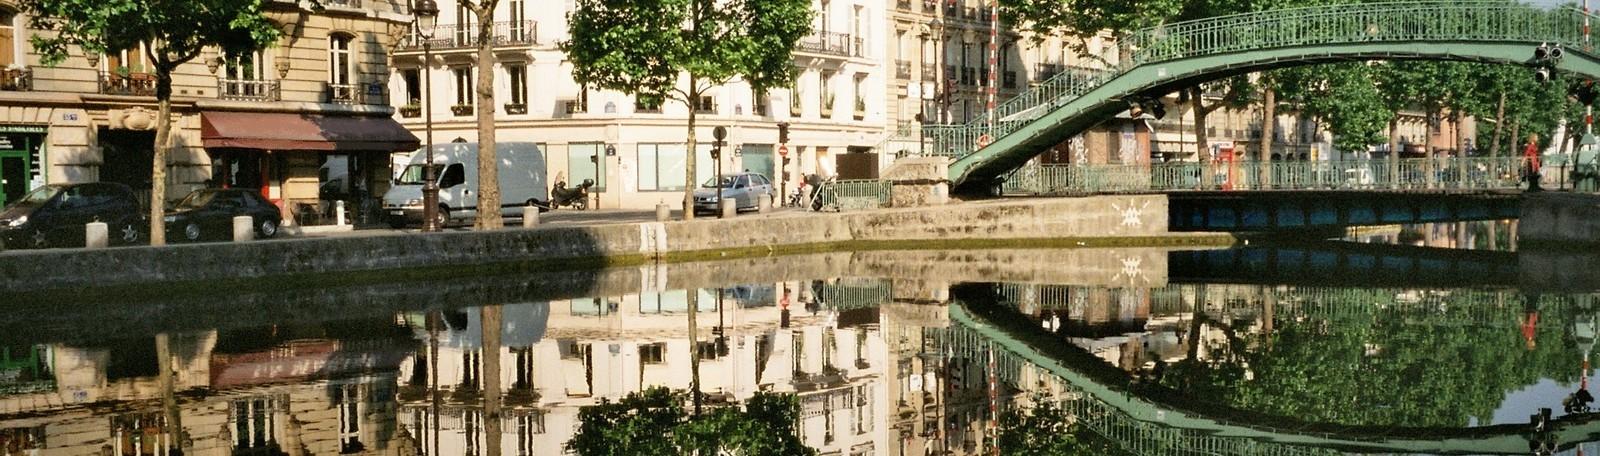 Car Park Paris Canal Saint-Martin